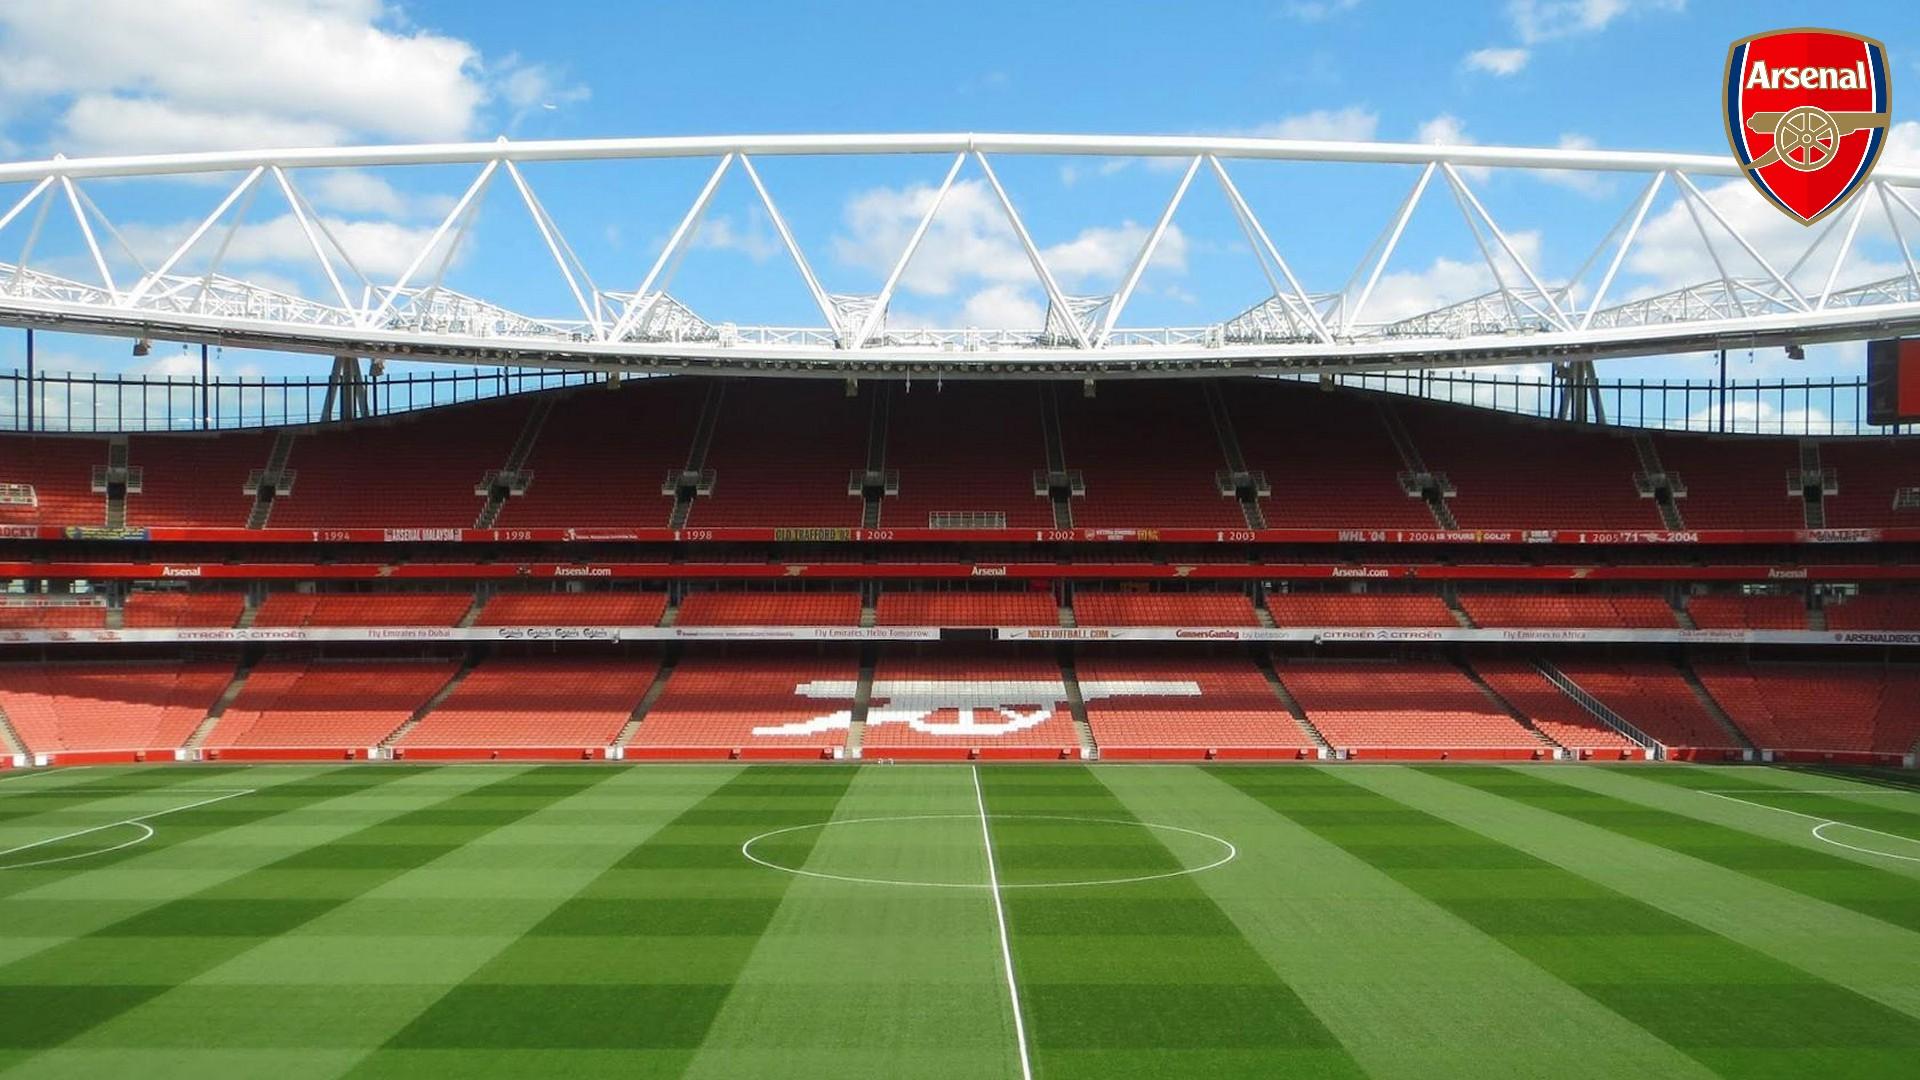 arsenal stadium mac backgrounds with